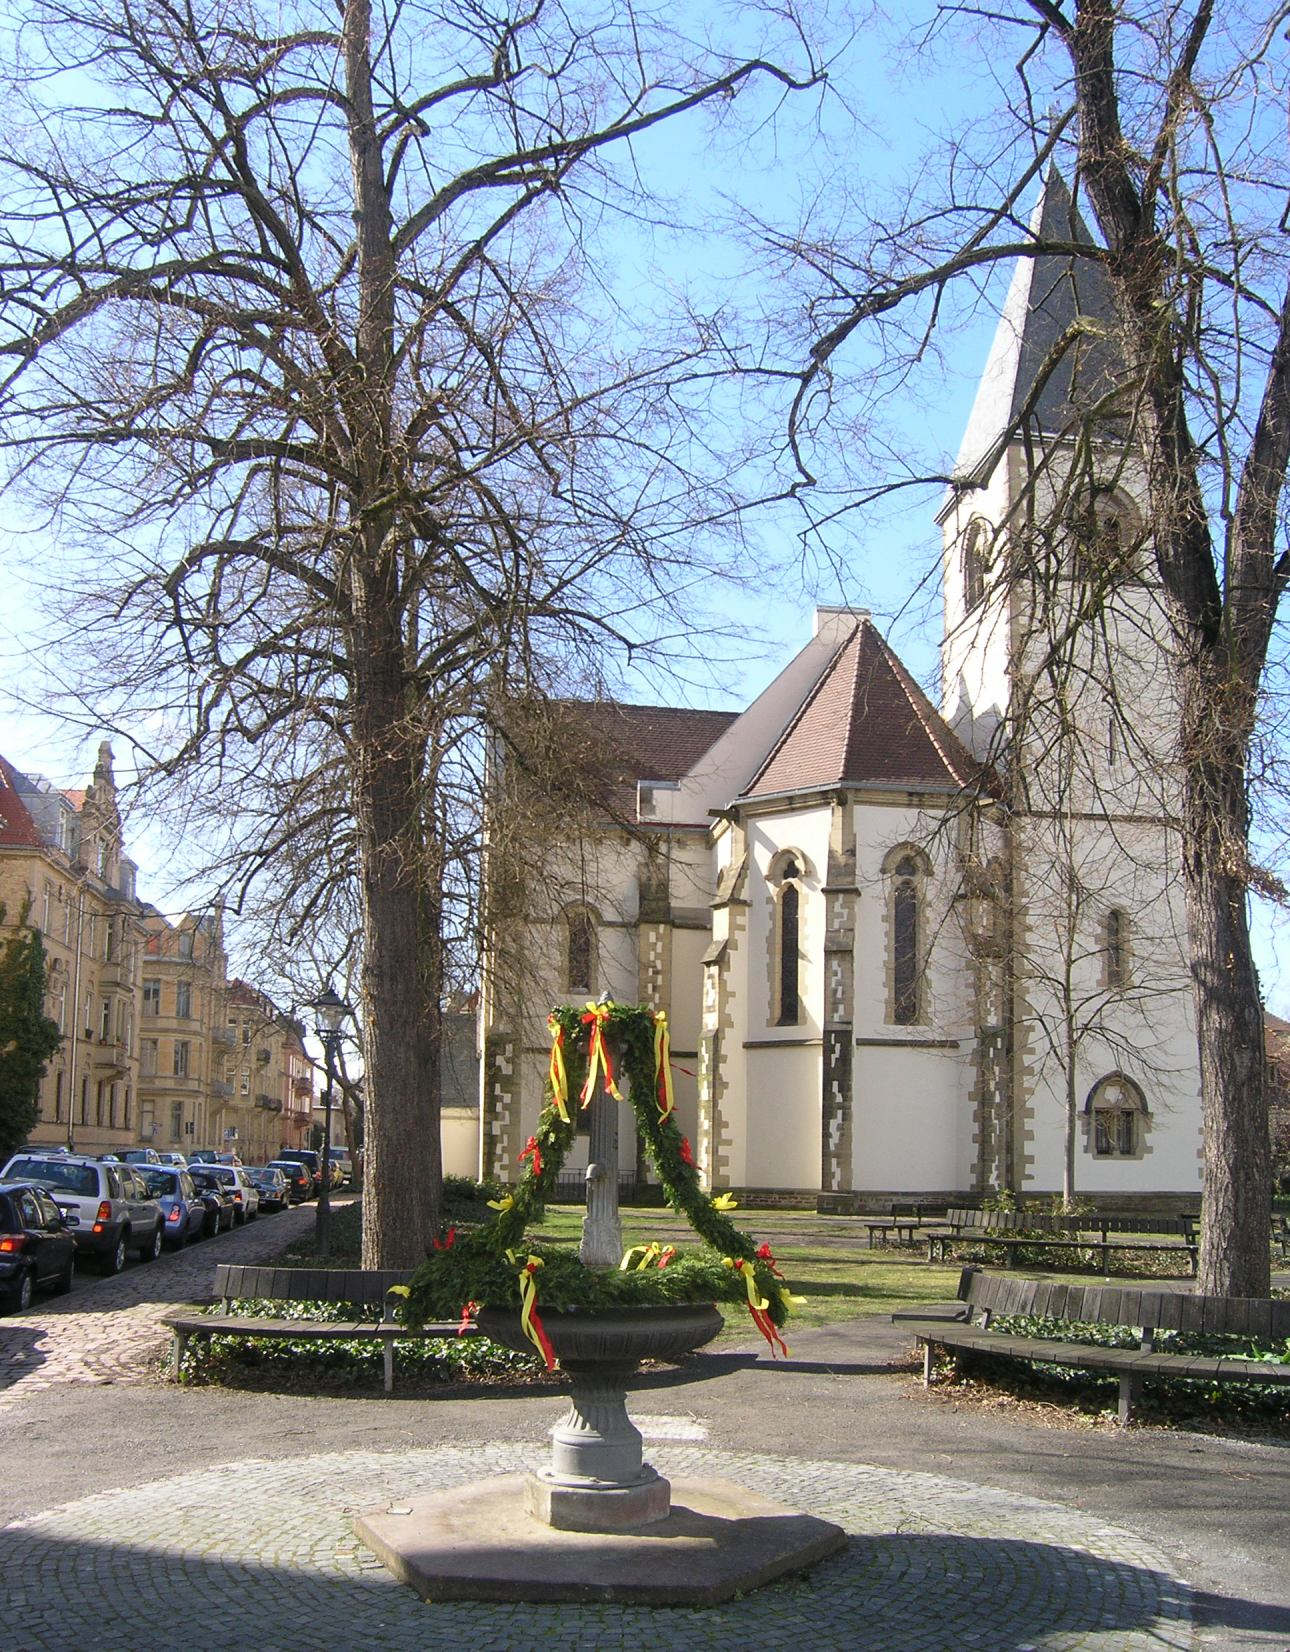 Altkatholische Kirche Karlsruhe